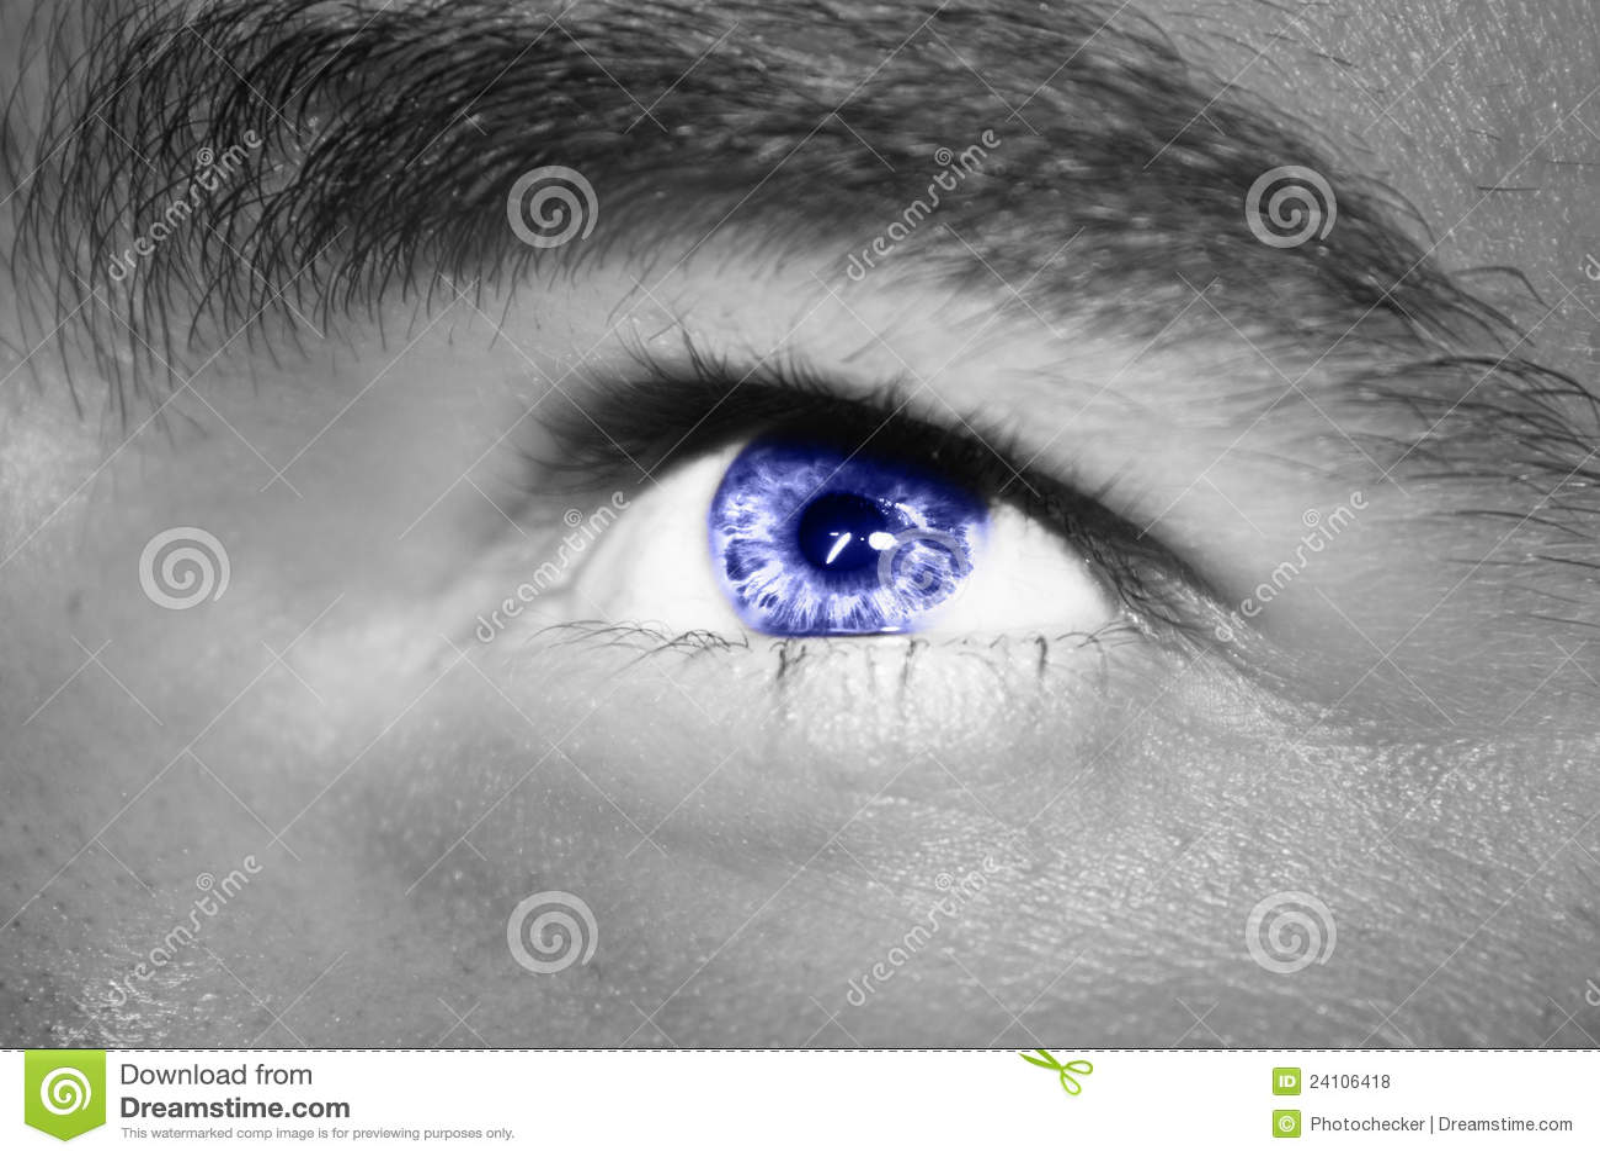 Black Eye In Focus Royalty Free Stock Photos - Image: 24106418